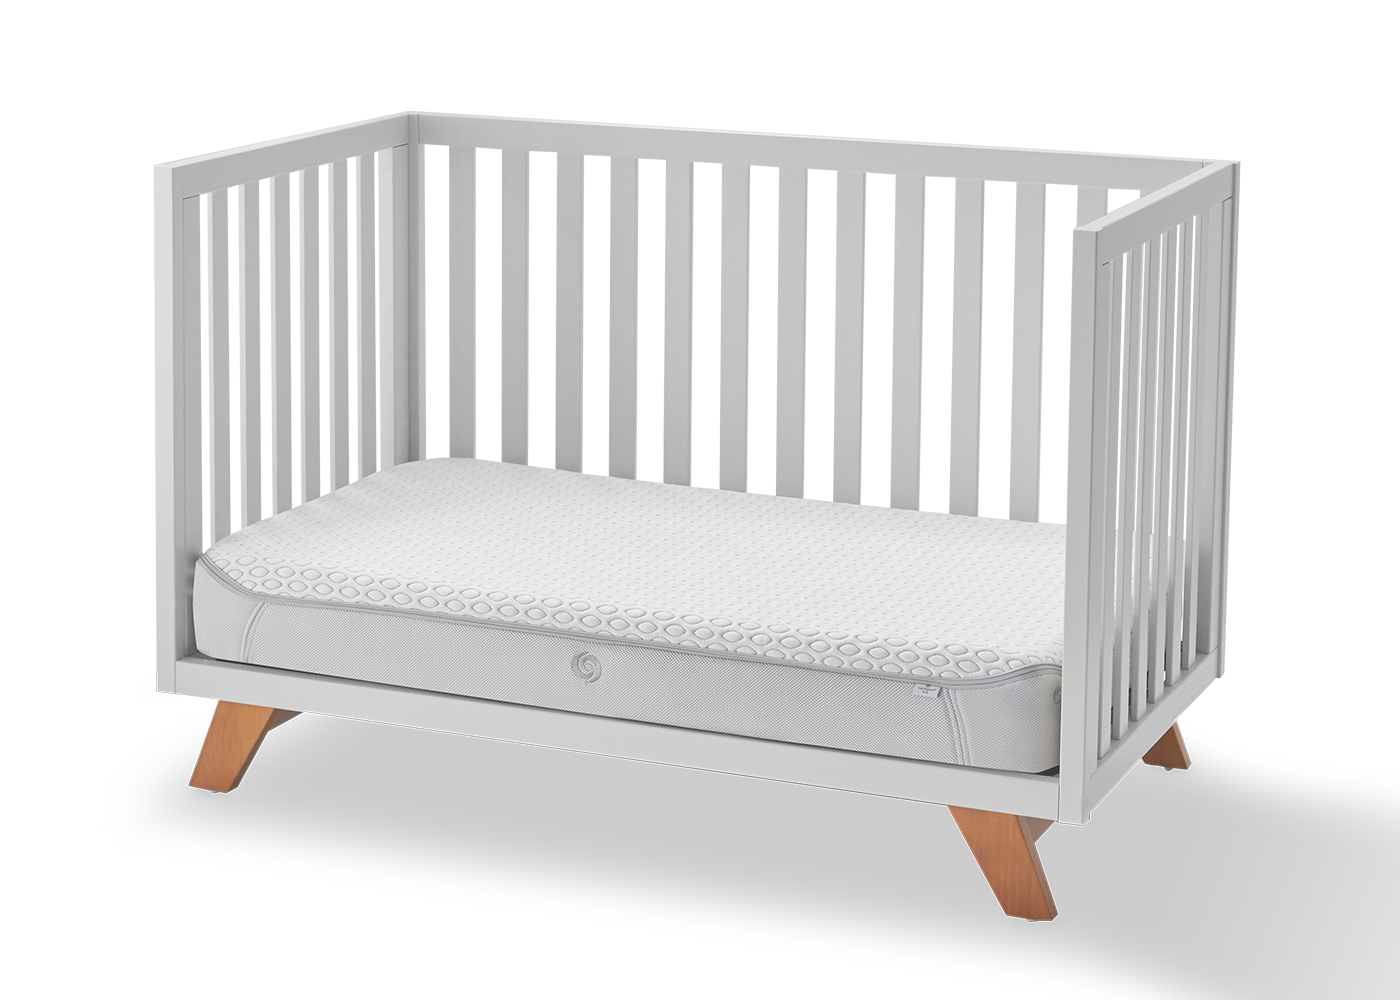 Air-X Performance Crib and Toddler Mattress